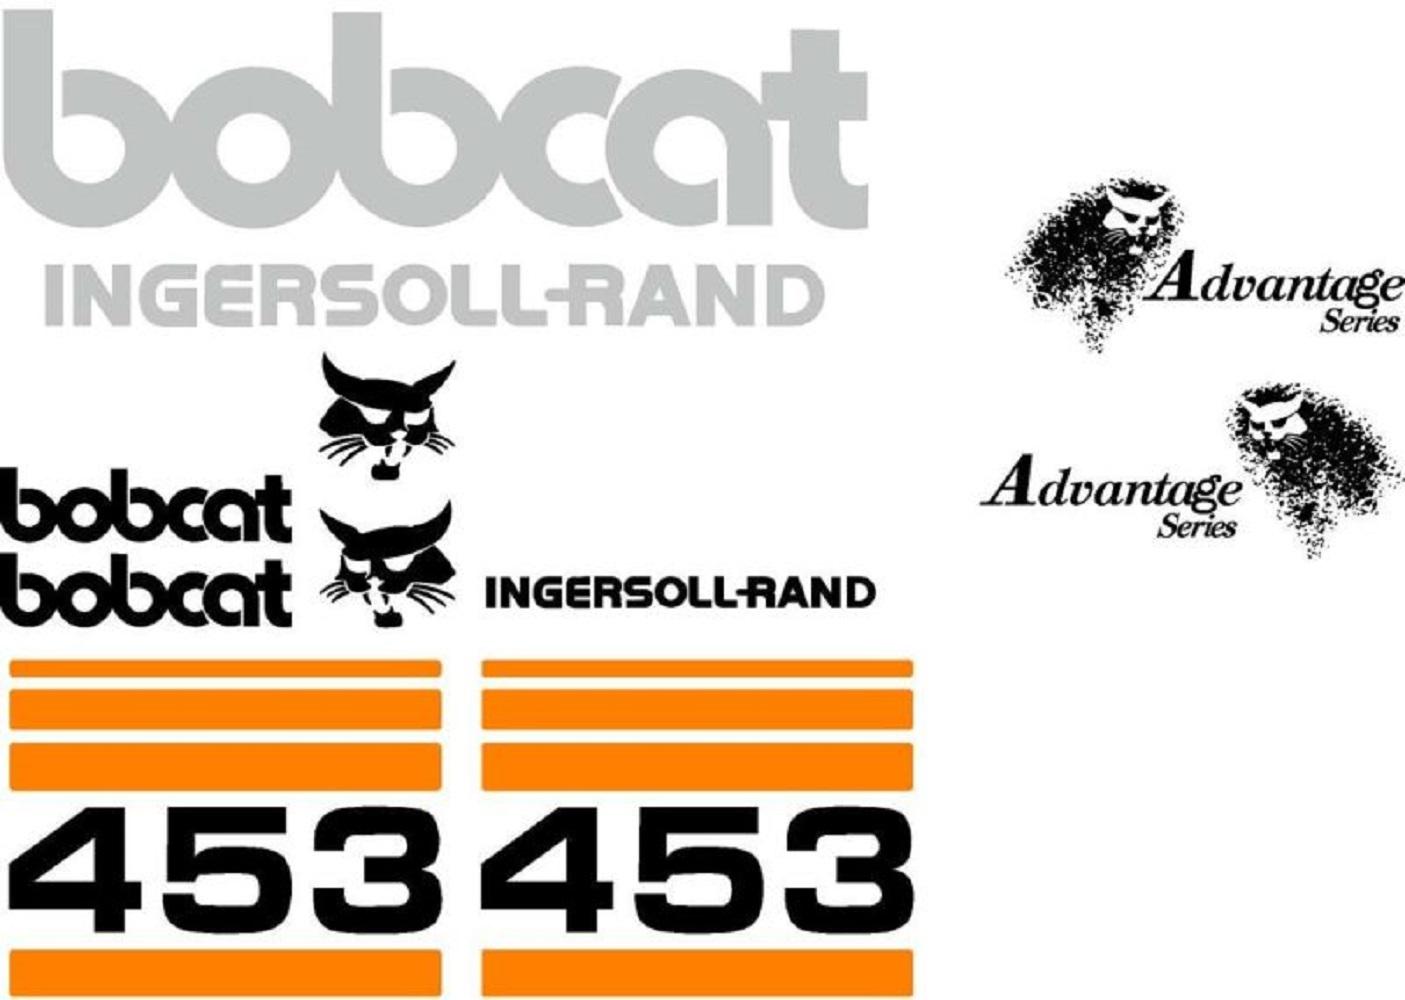 Bobcat 453 Excavator Whole Machine Decal Set Ingersoll Rand & Advantage Series by Aftermarket Bobcat